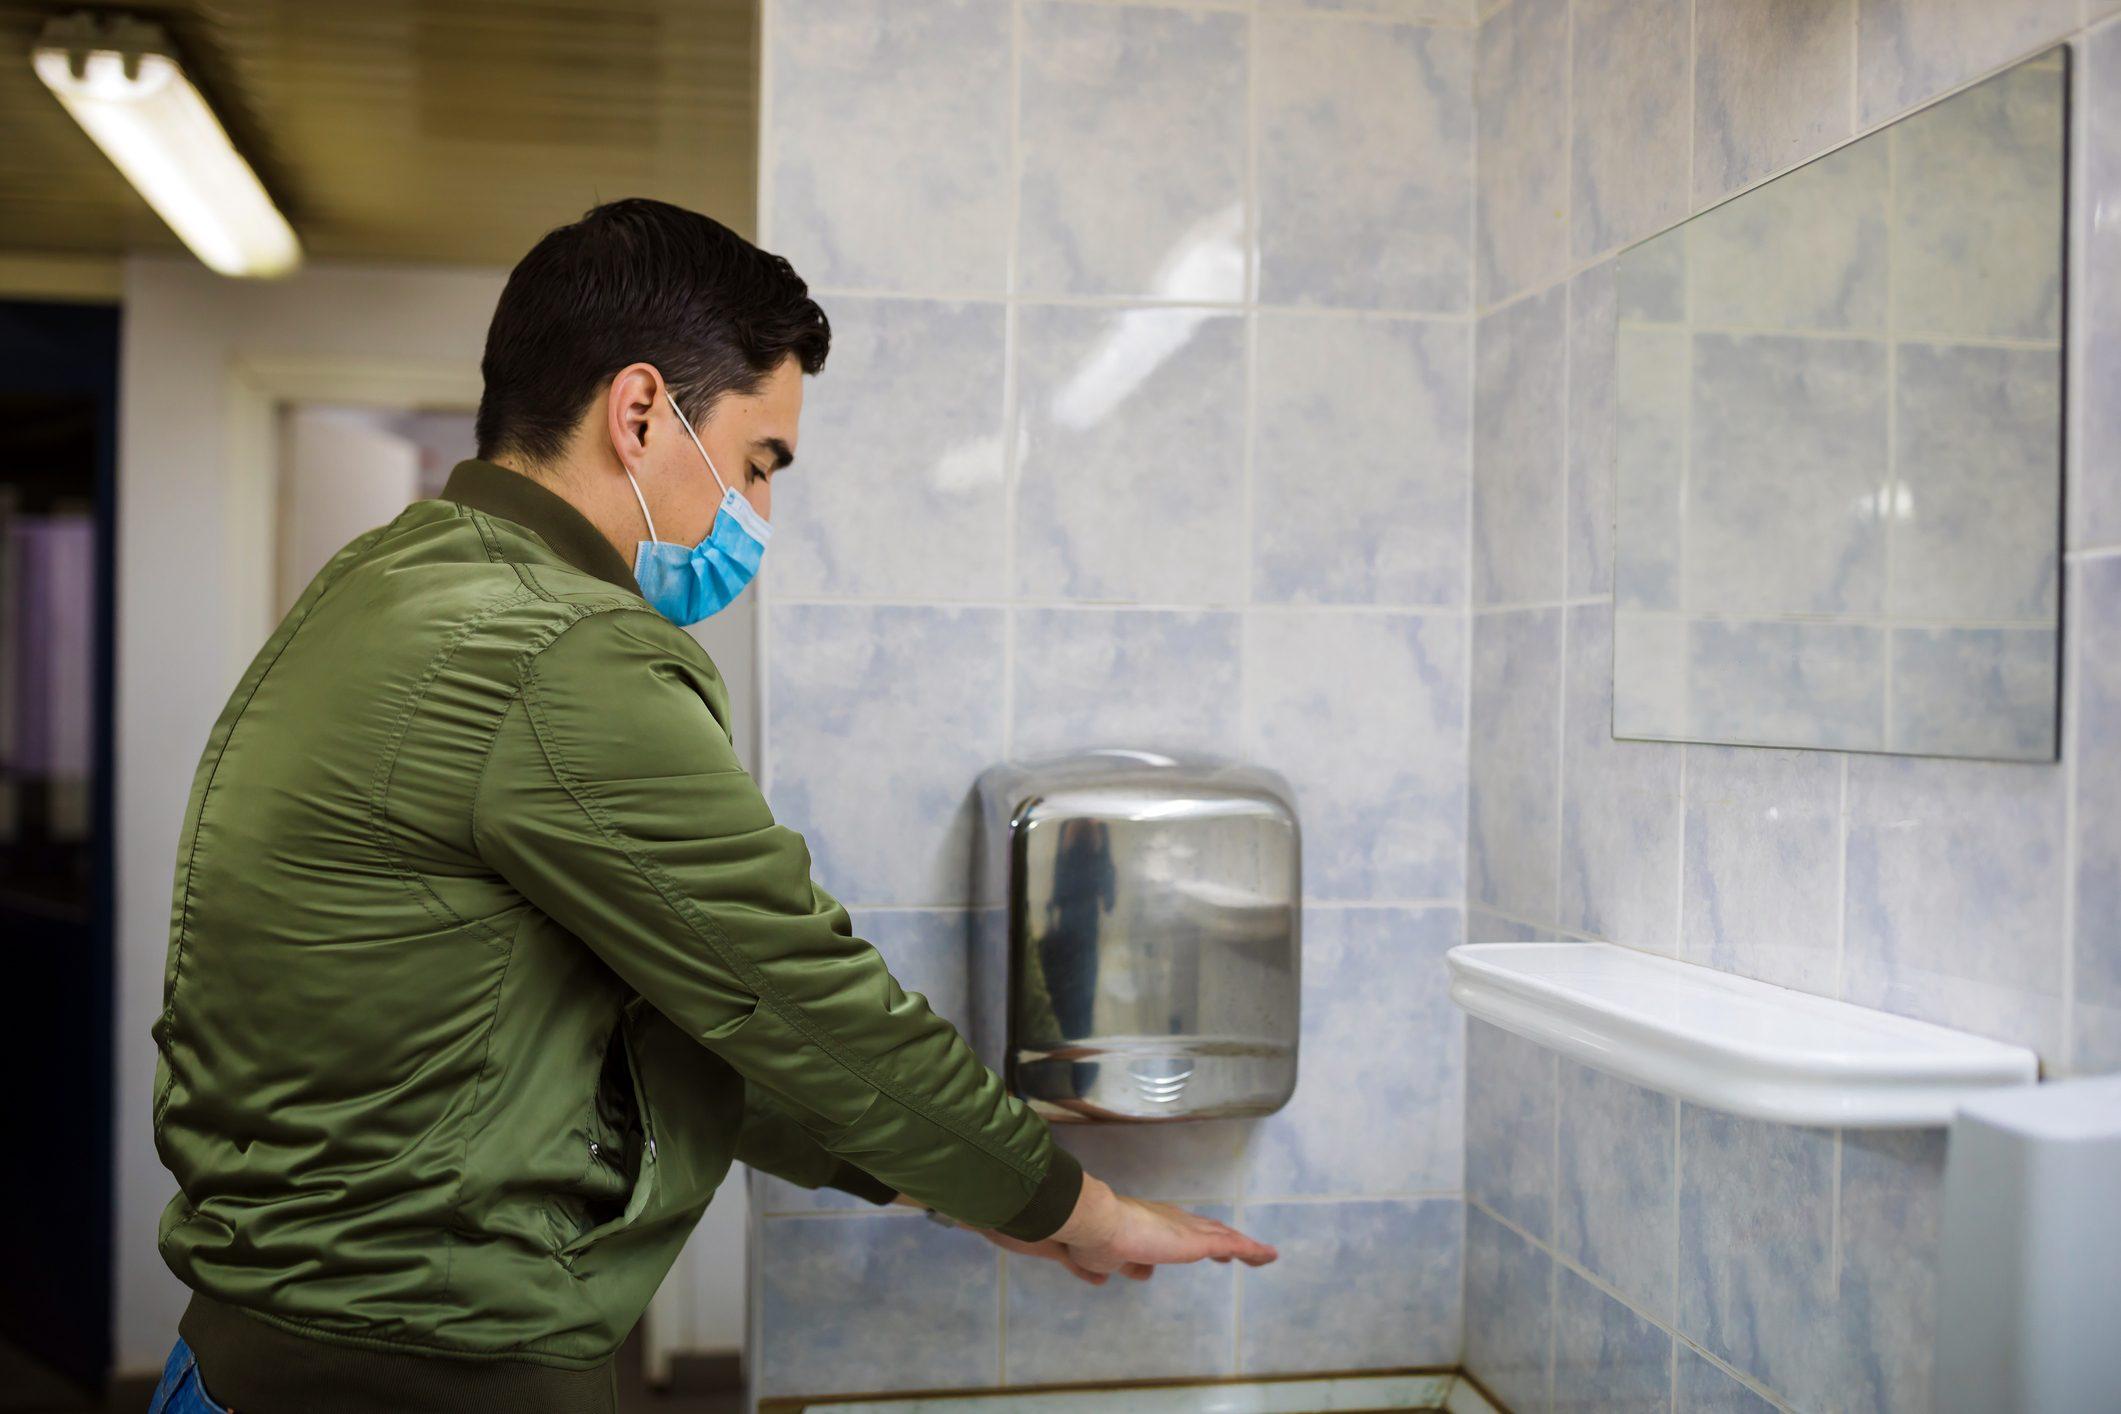 man drying hands in public restroom